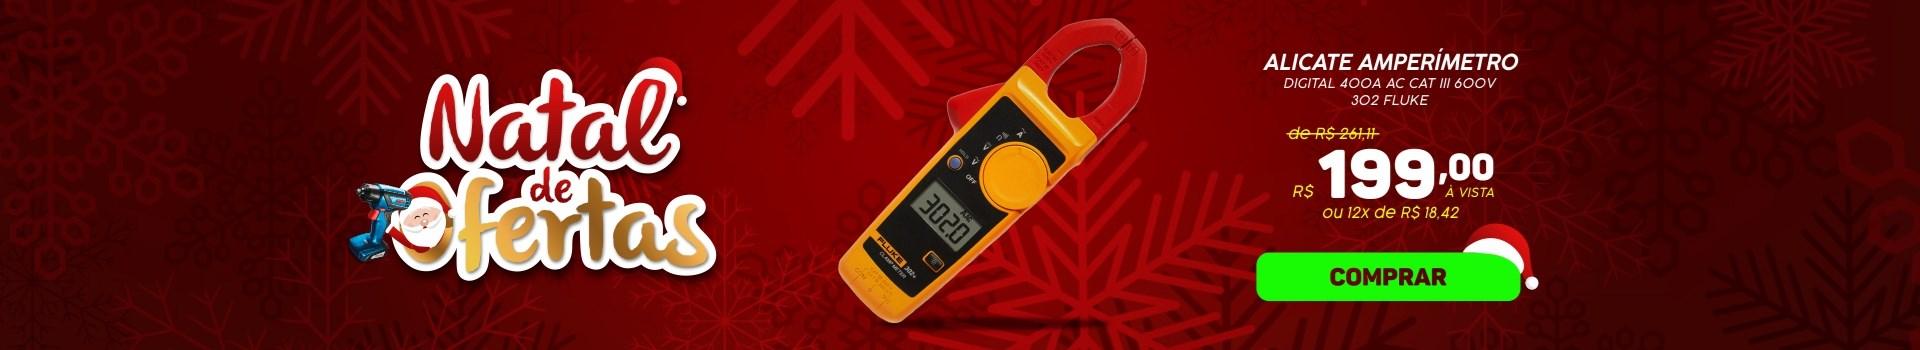 Alicate Amperímetro Digital 400A AC CAT III FLUKE